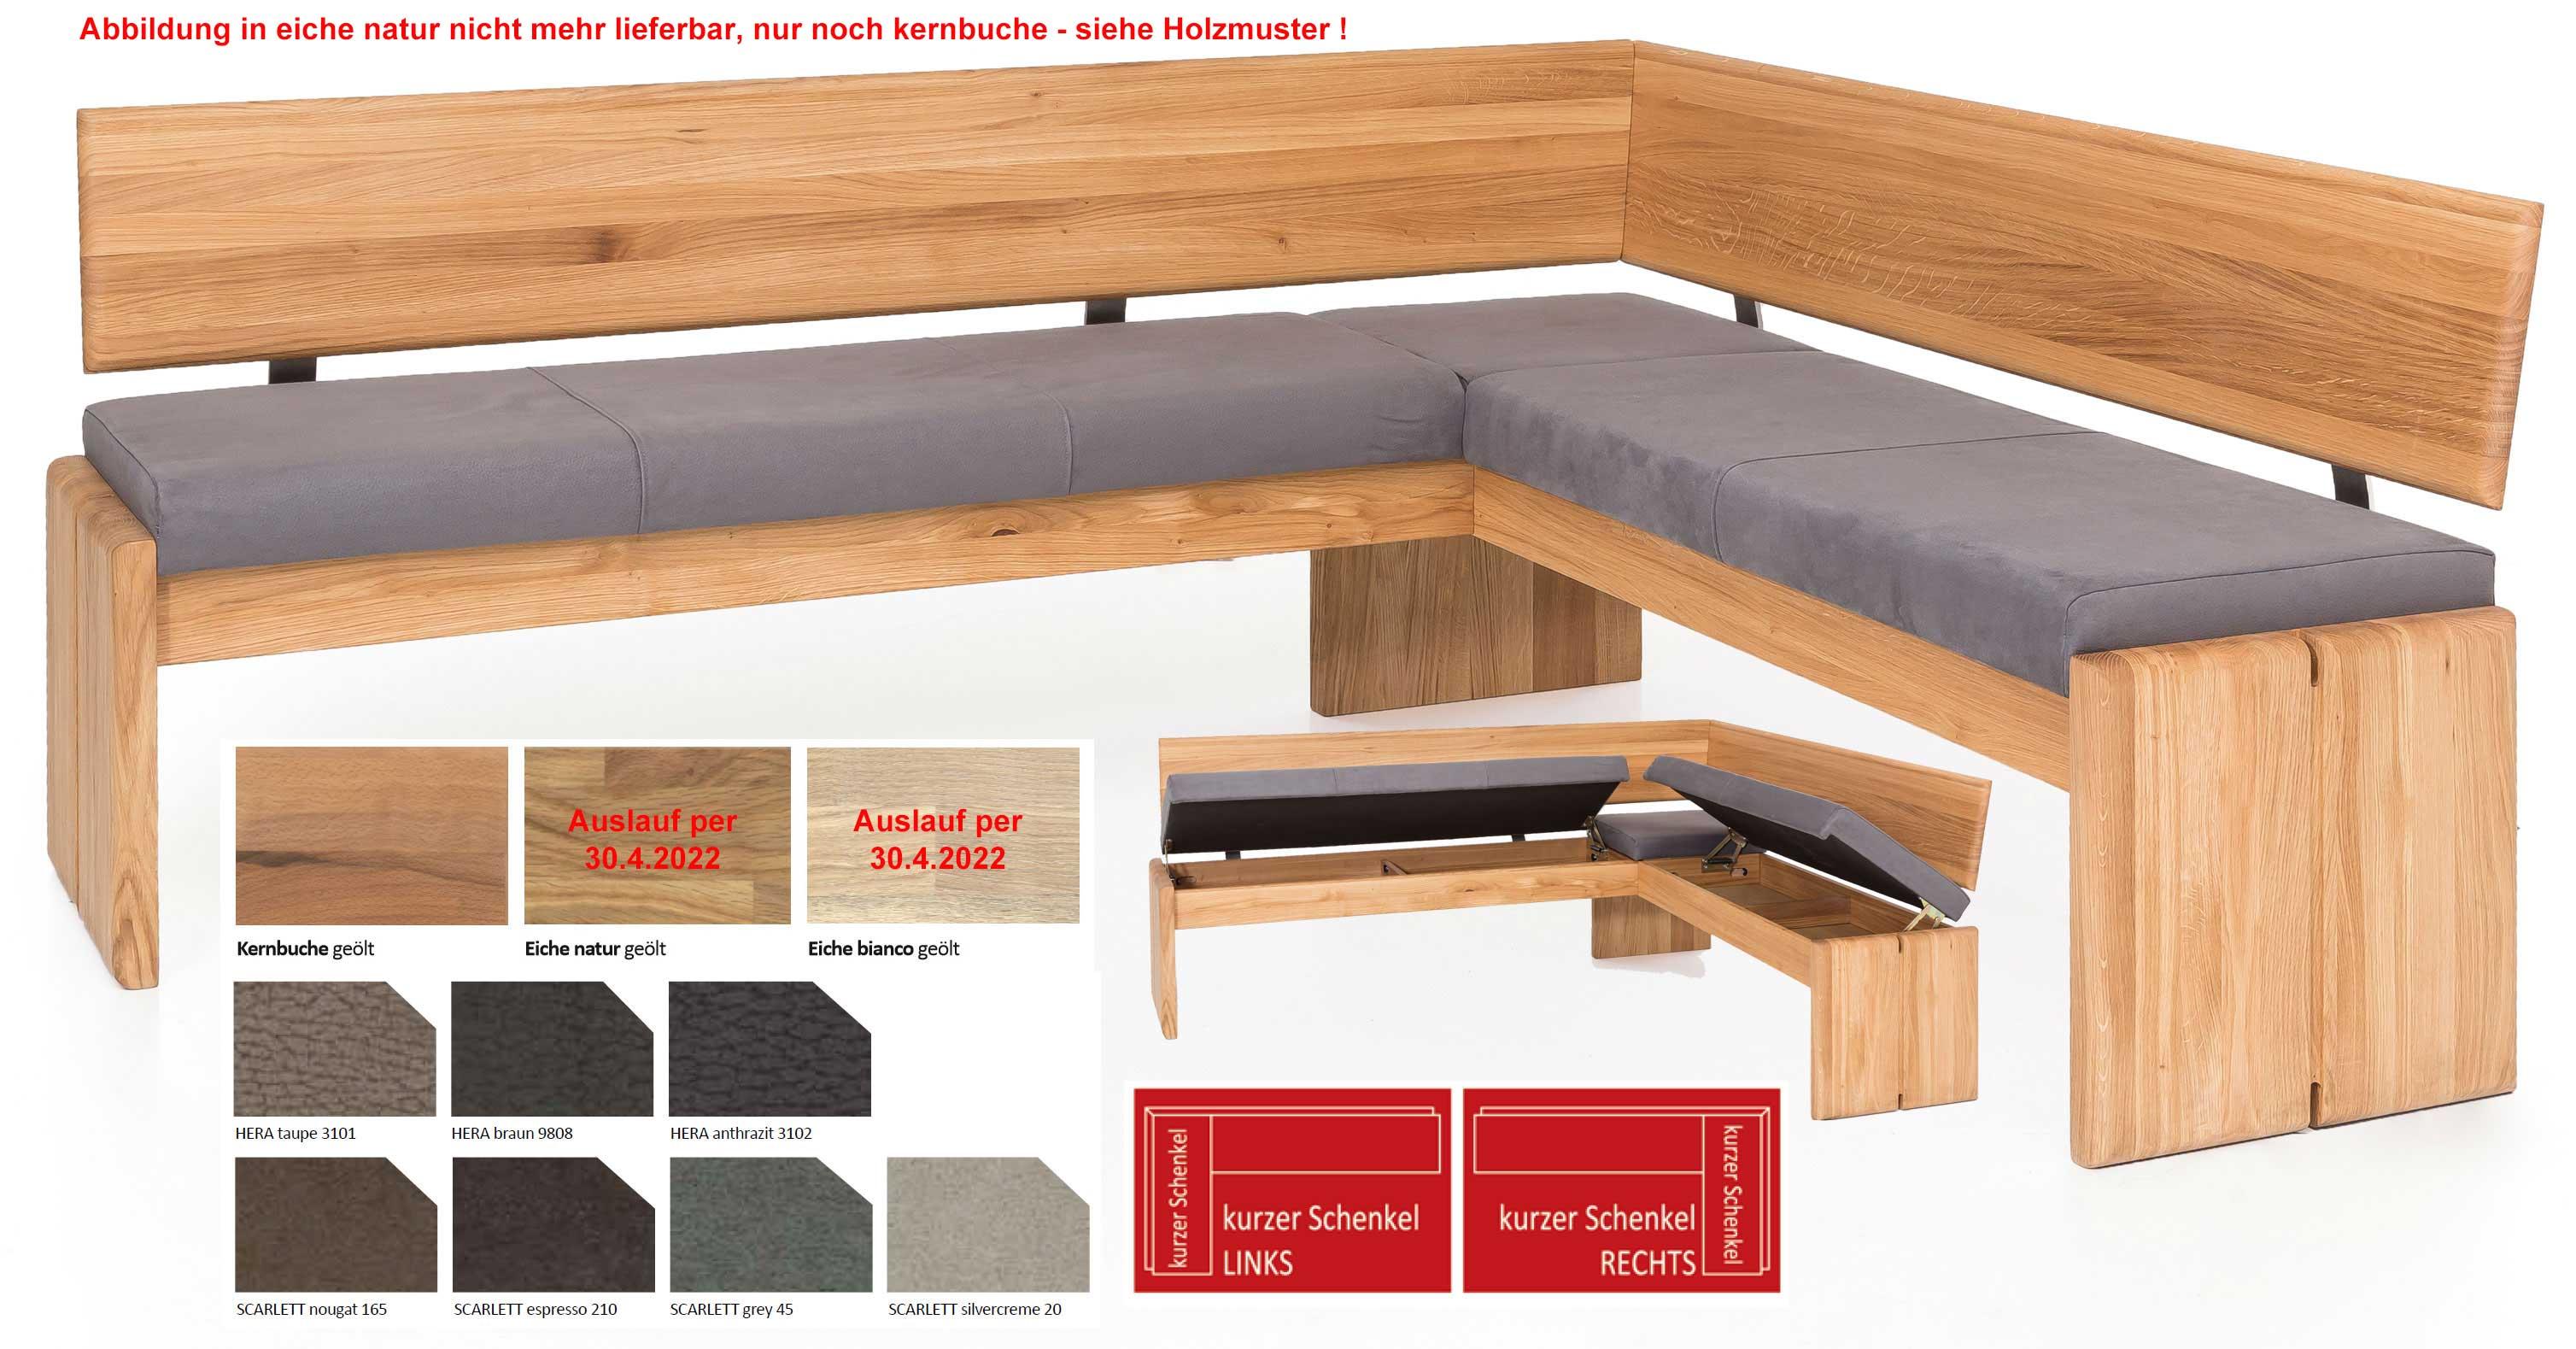 Standard Furniture Stockholm Truheneckbank massiv eiche mit Polster